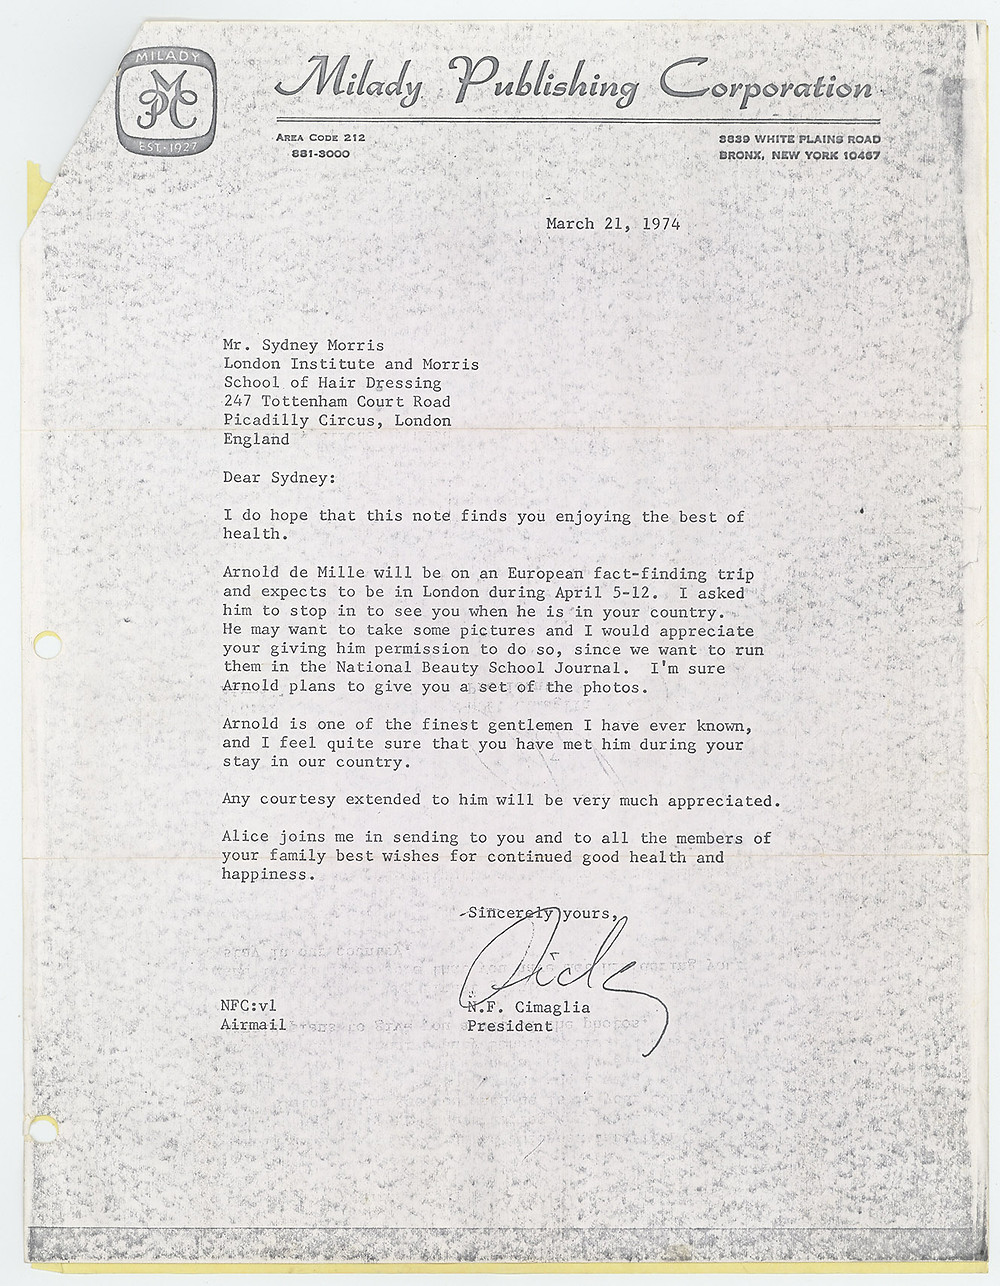 Letter from N.F. Cimaglia to Sydney Morris about Arnold de Mille's visit, 1974.